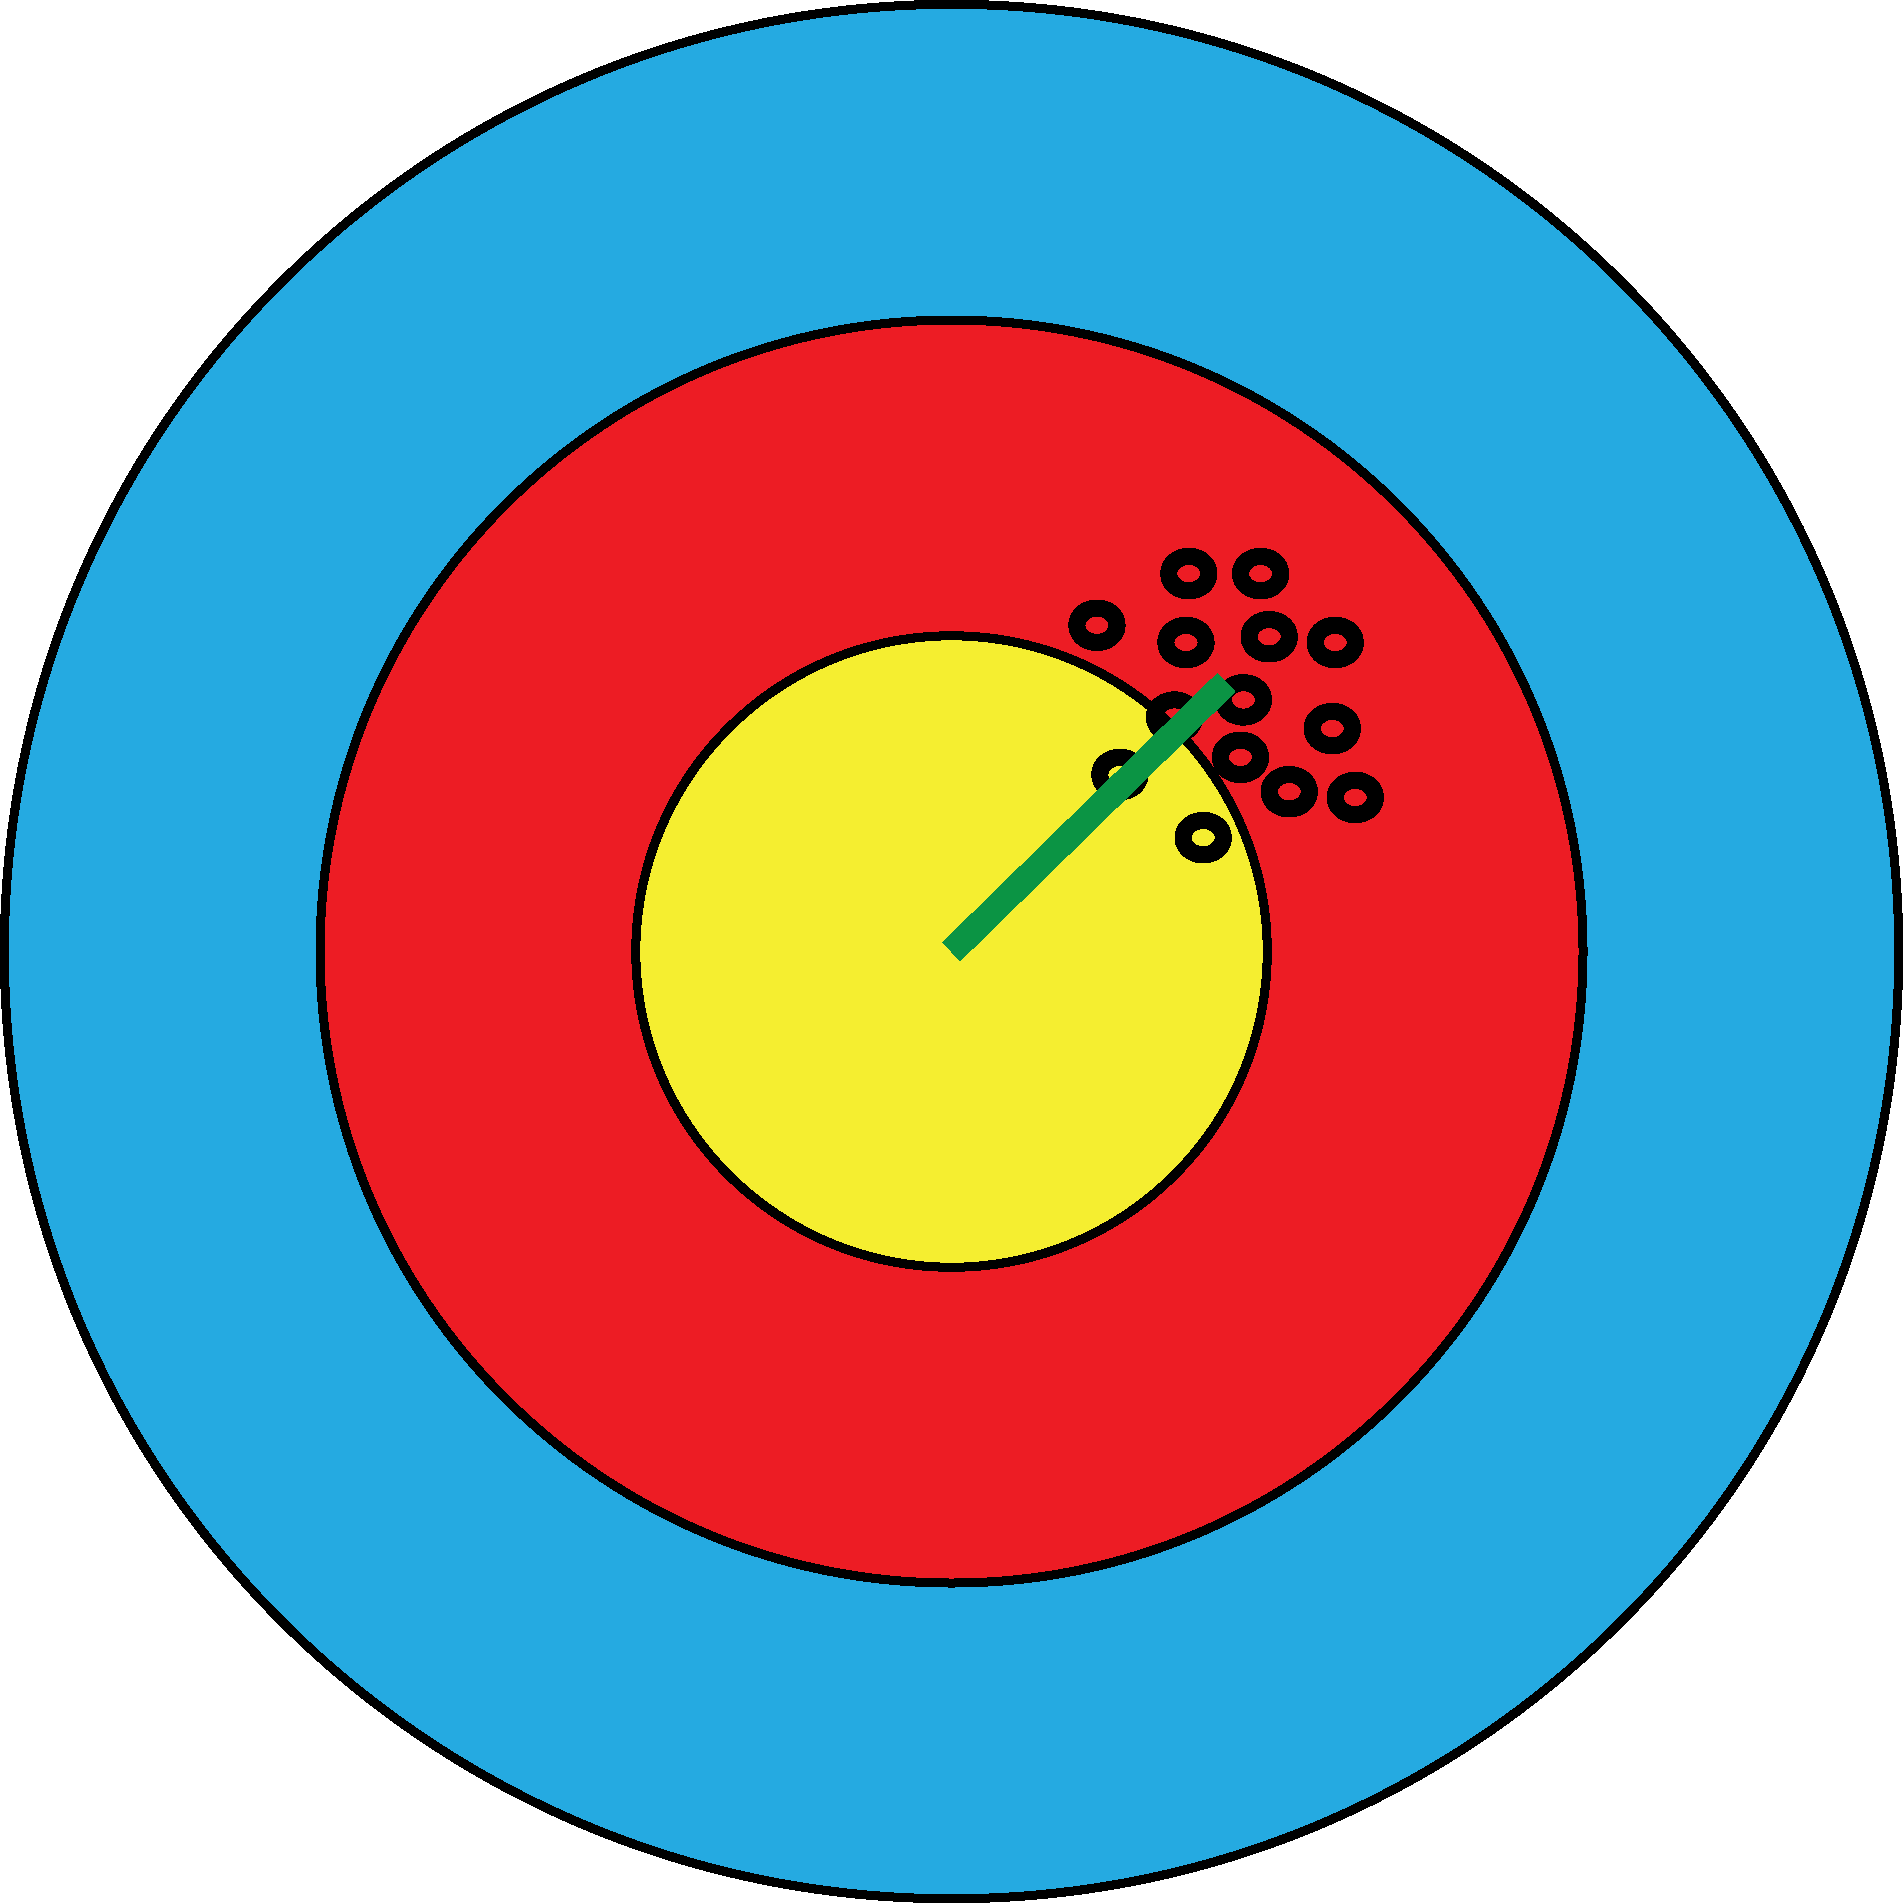 08_statistical_testing_for_high_throughput/img/TargetBias.png